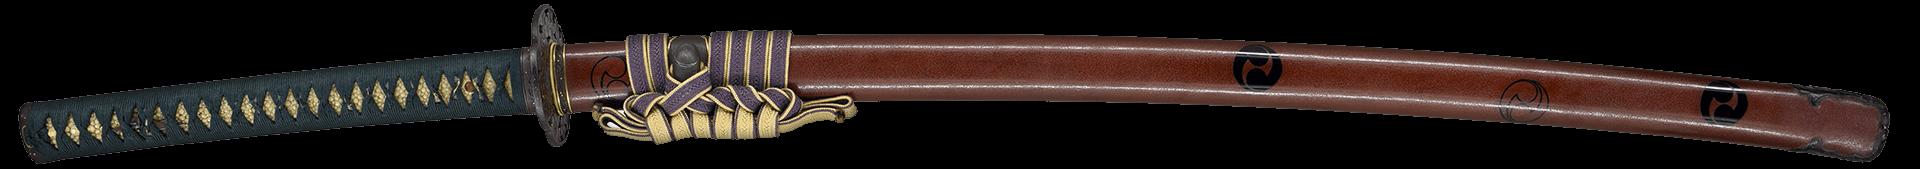 JAPANESE SAMURAI SWORD FOR SALE BUSHIDO KATANA SHOP